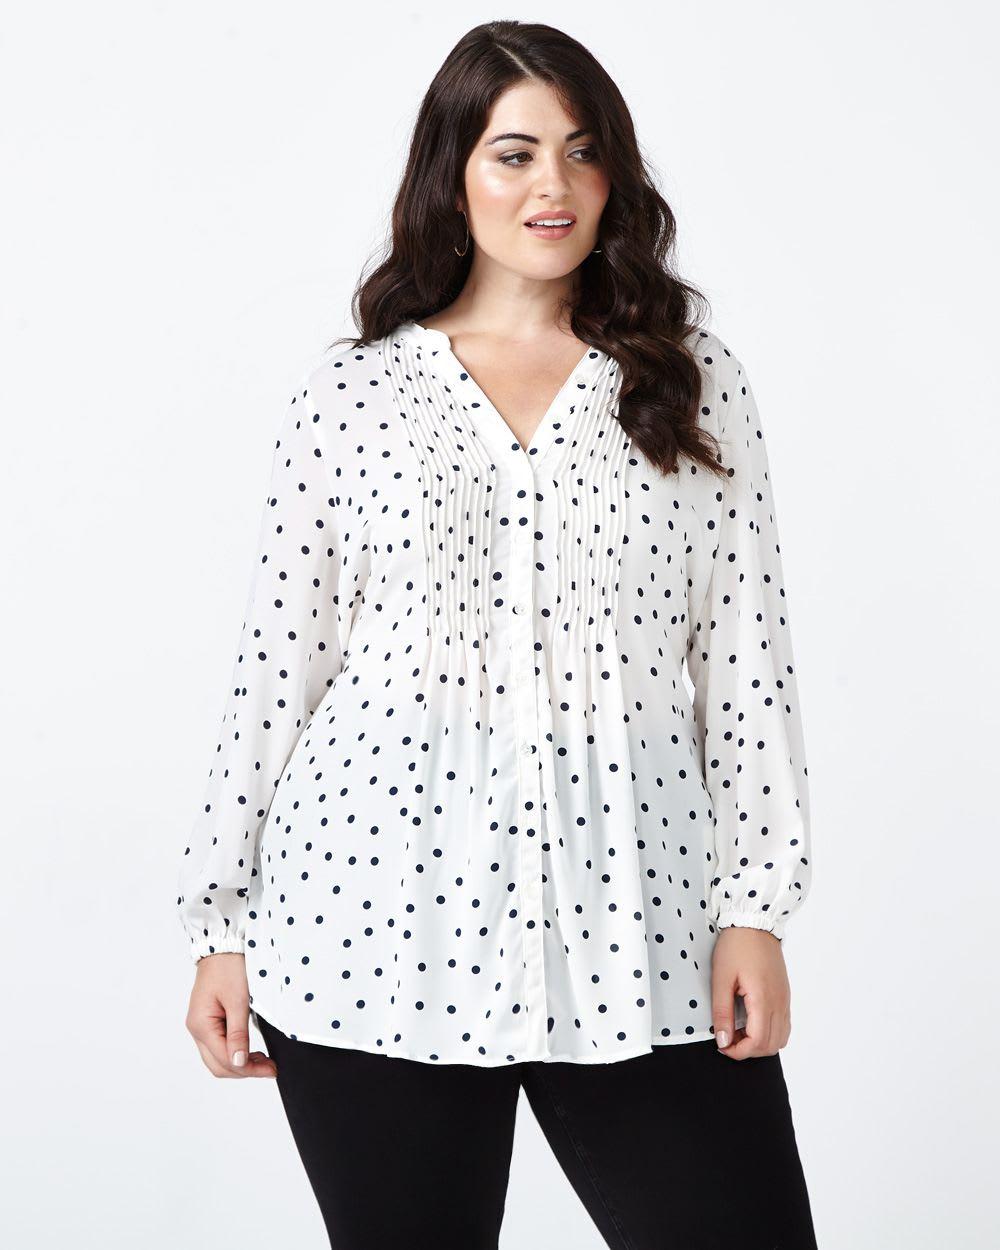 Pintuck blouse pattern labzada blouse melissa mccarthy printed pintuck blouse penningtons melissa mccarthy printed pintuck blouse source sewing pattern jeuxipadfo Image collections